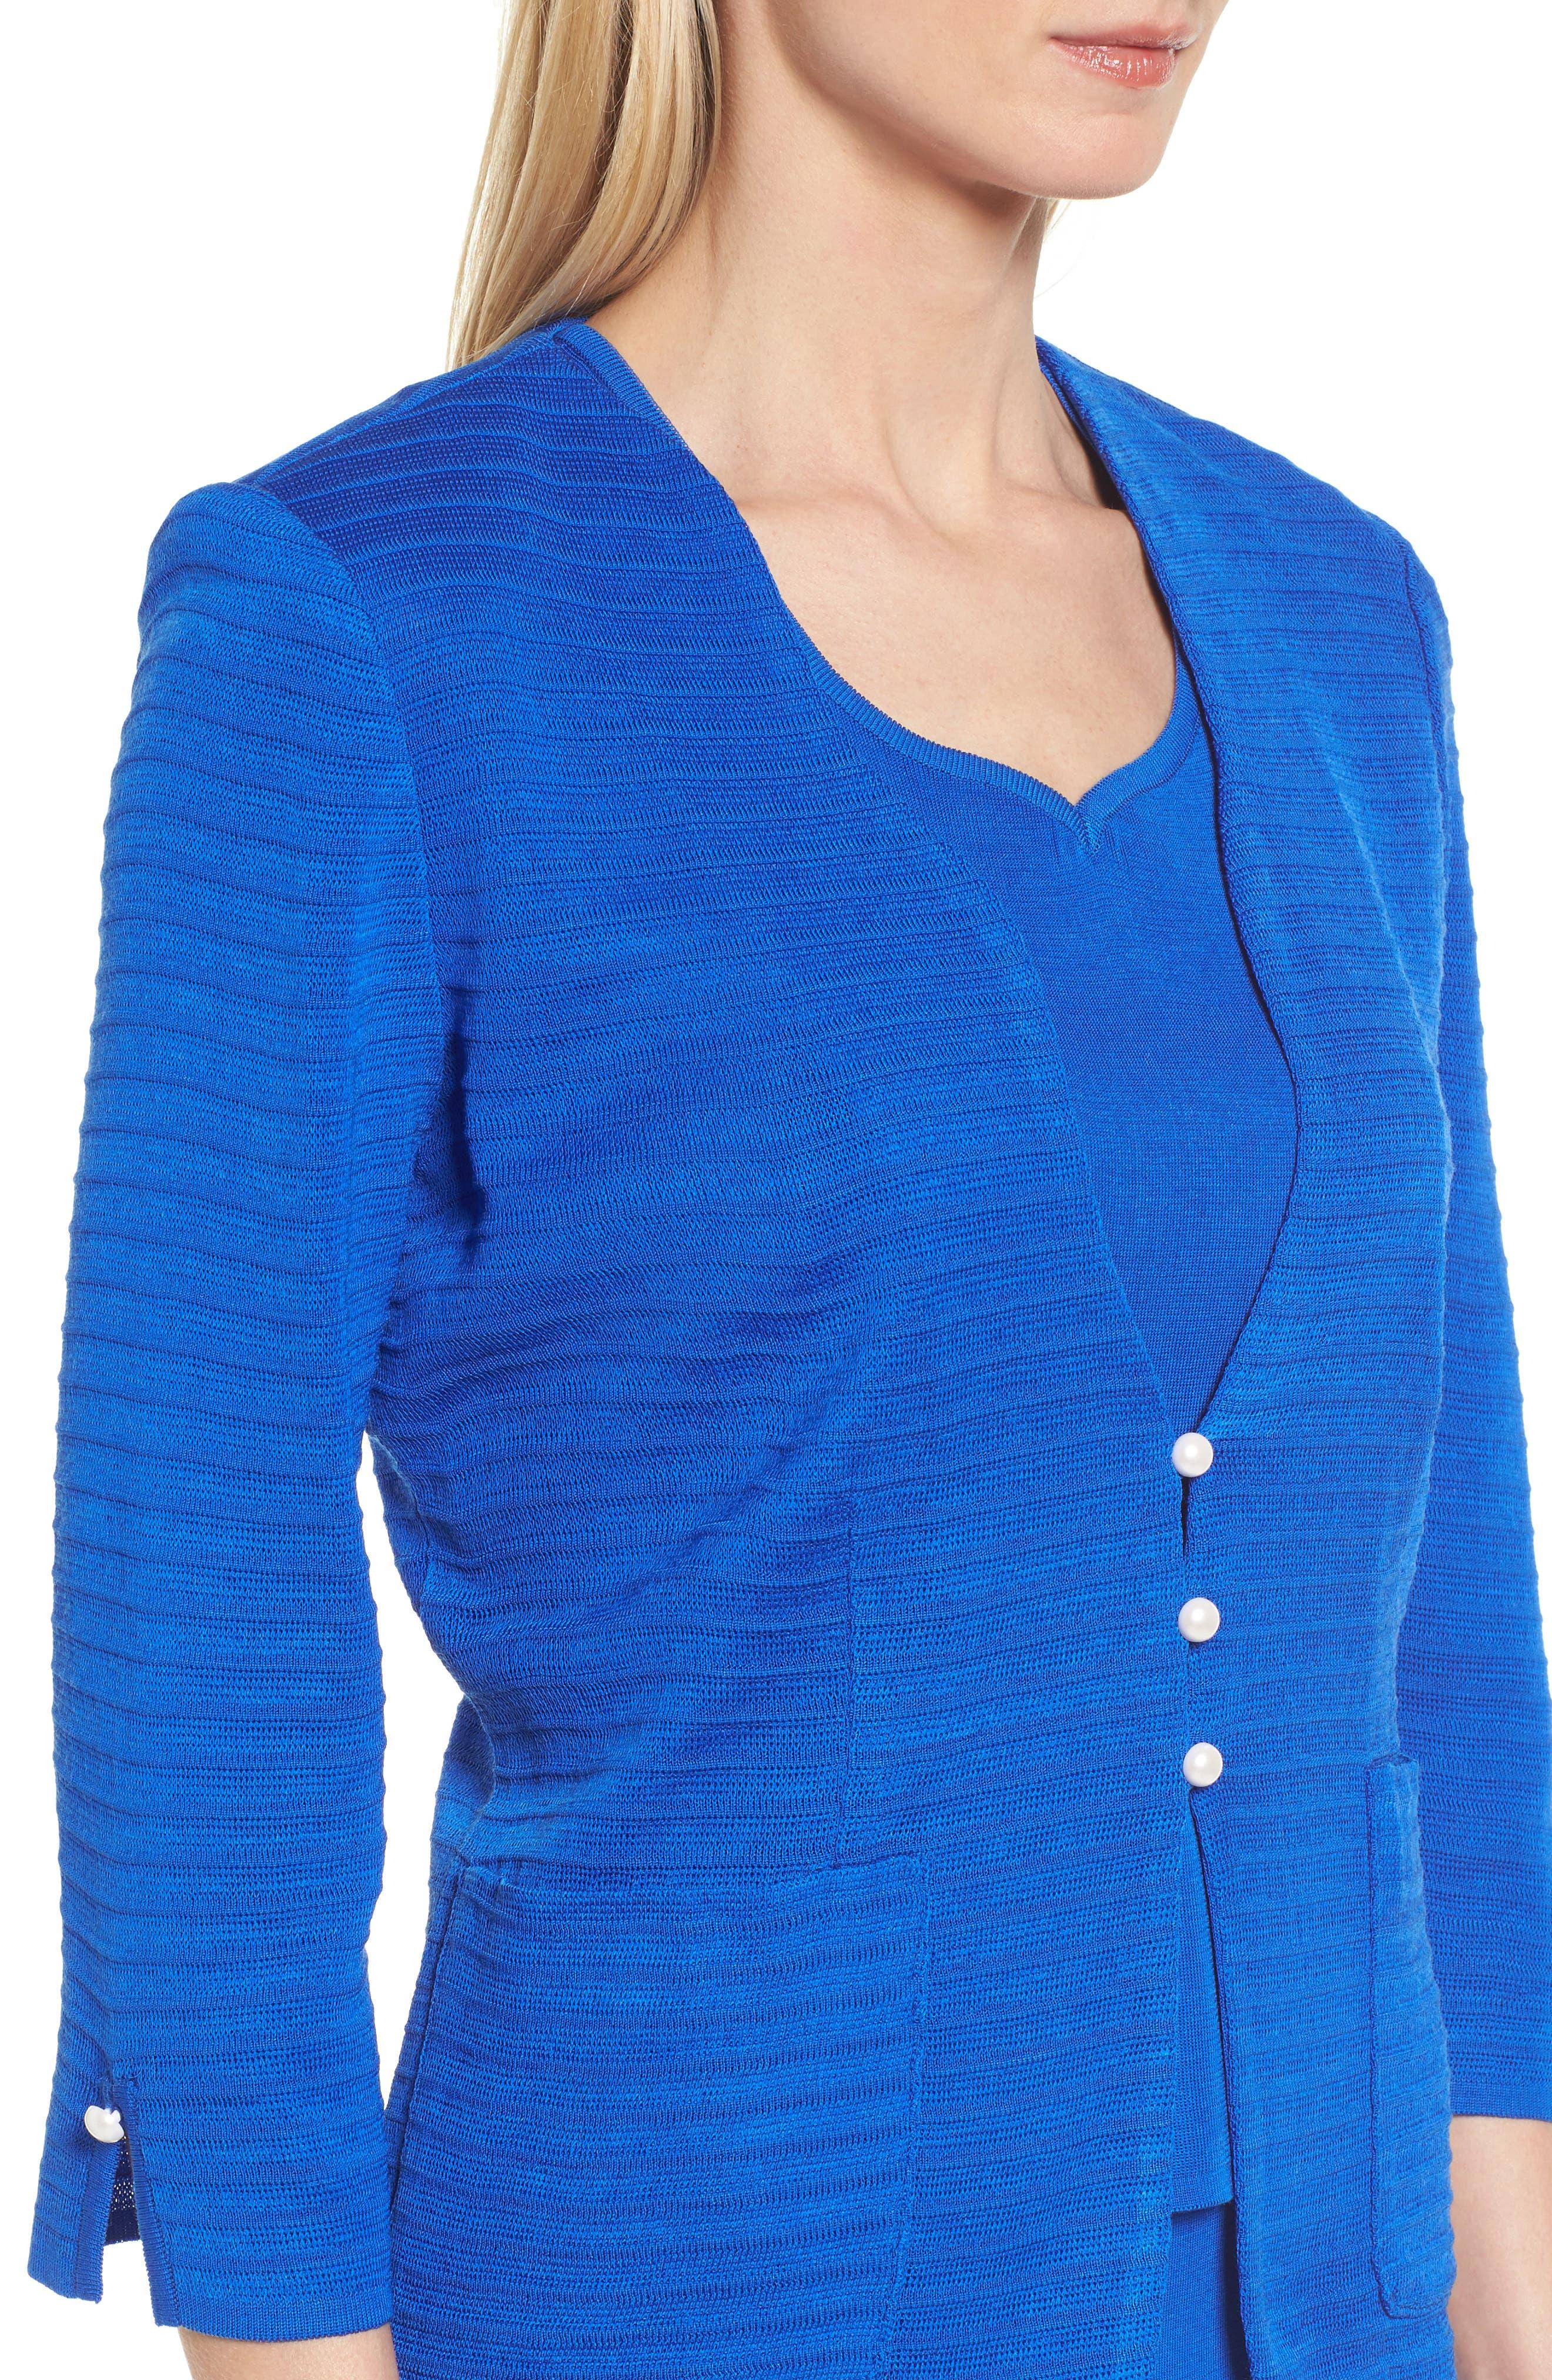 Textured Three Quarter Sleeve Jacket,                             Alternate thumbnail 4, color,                             PATRIOT BLUE